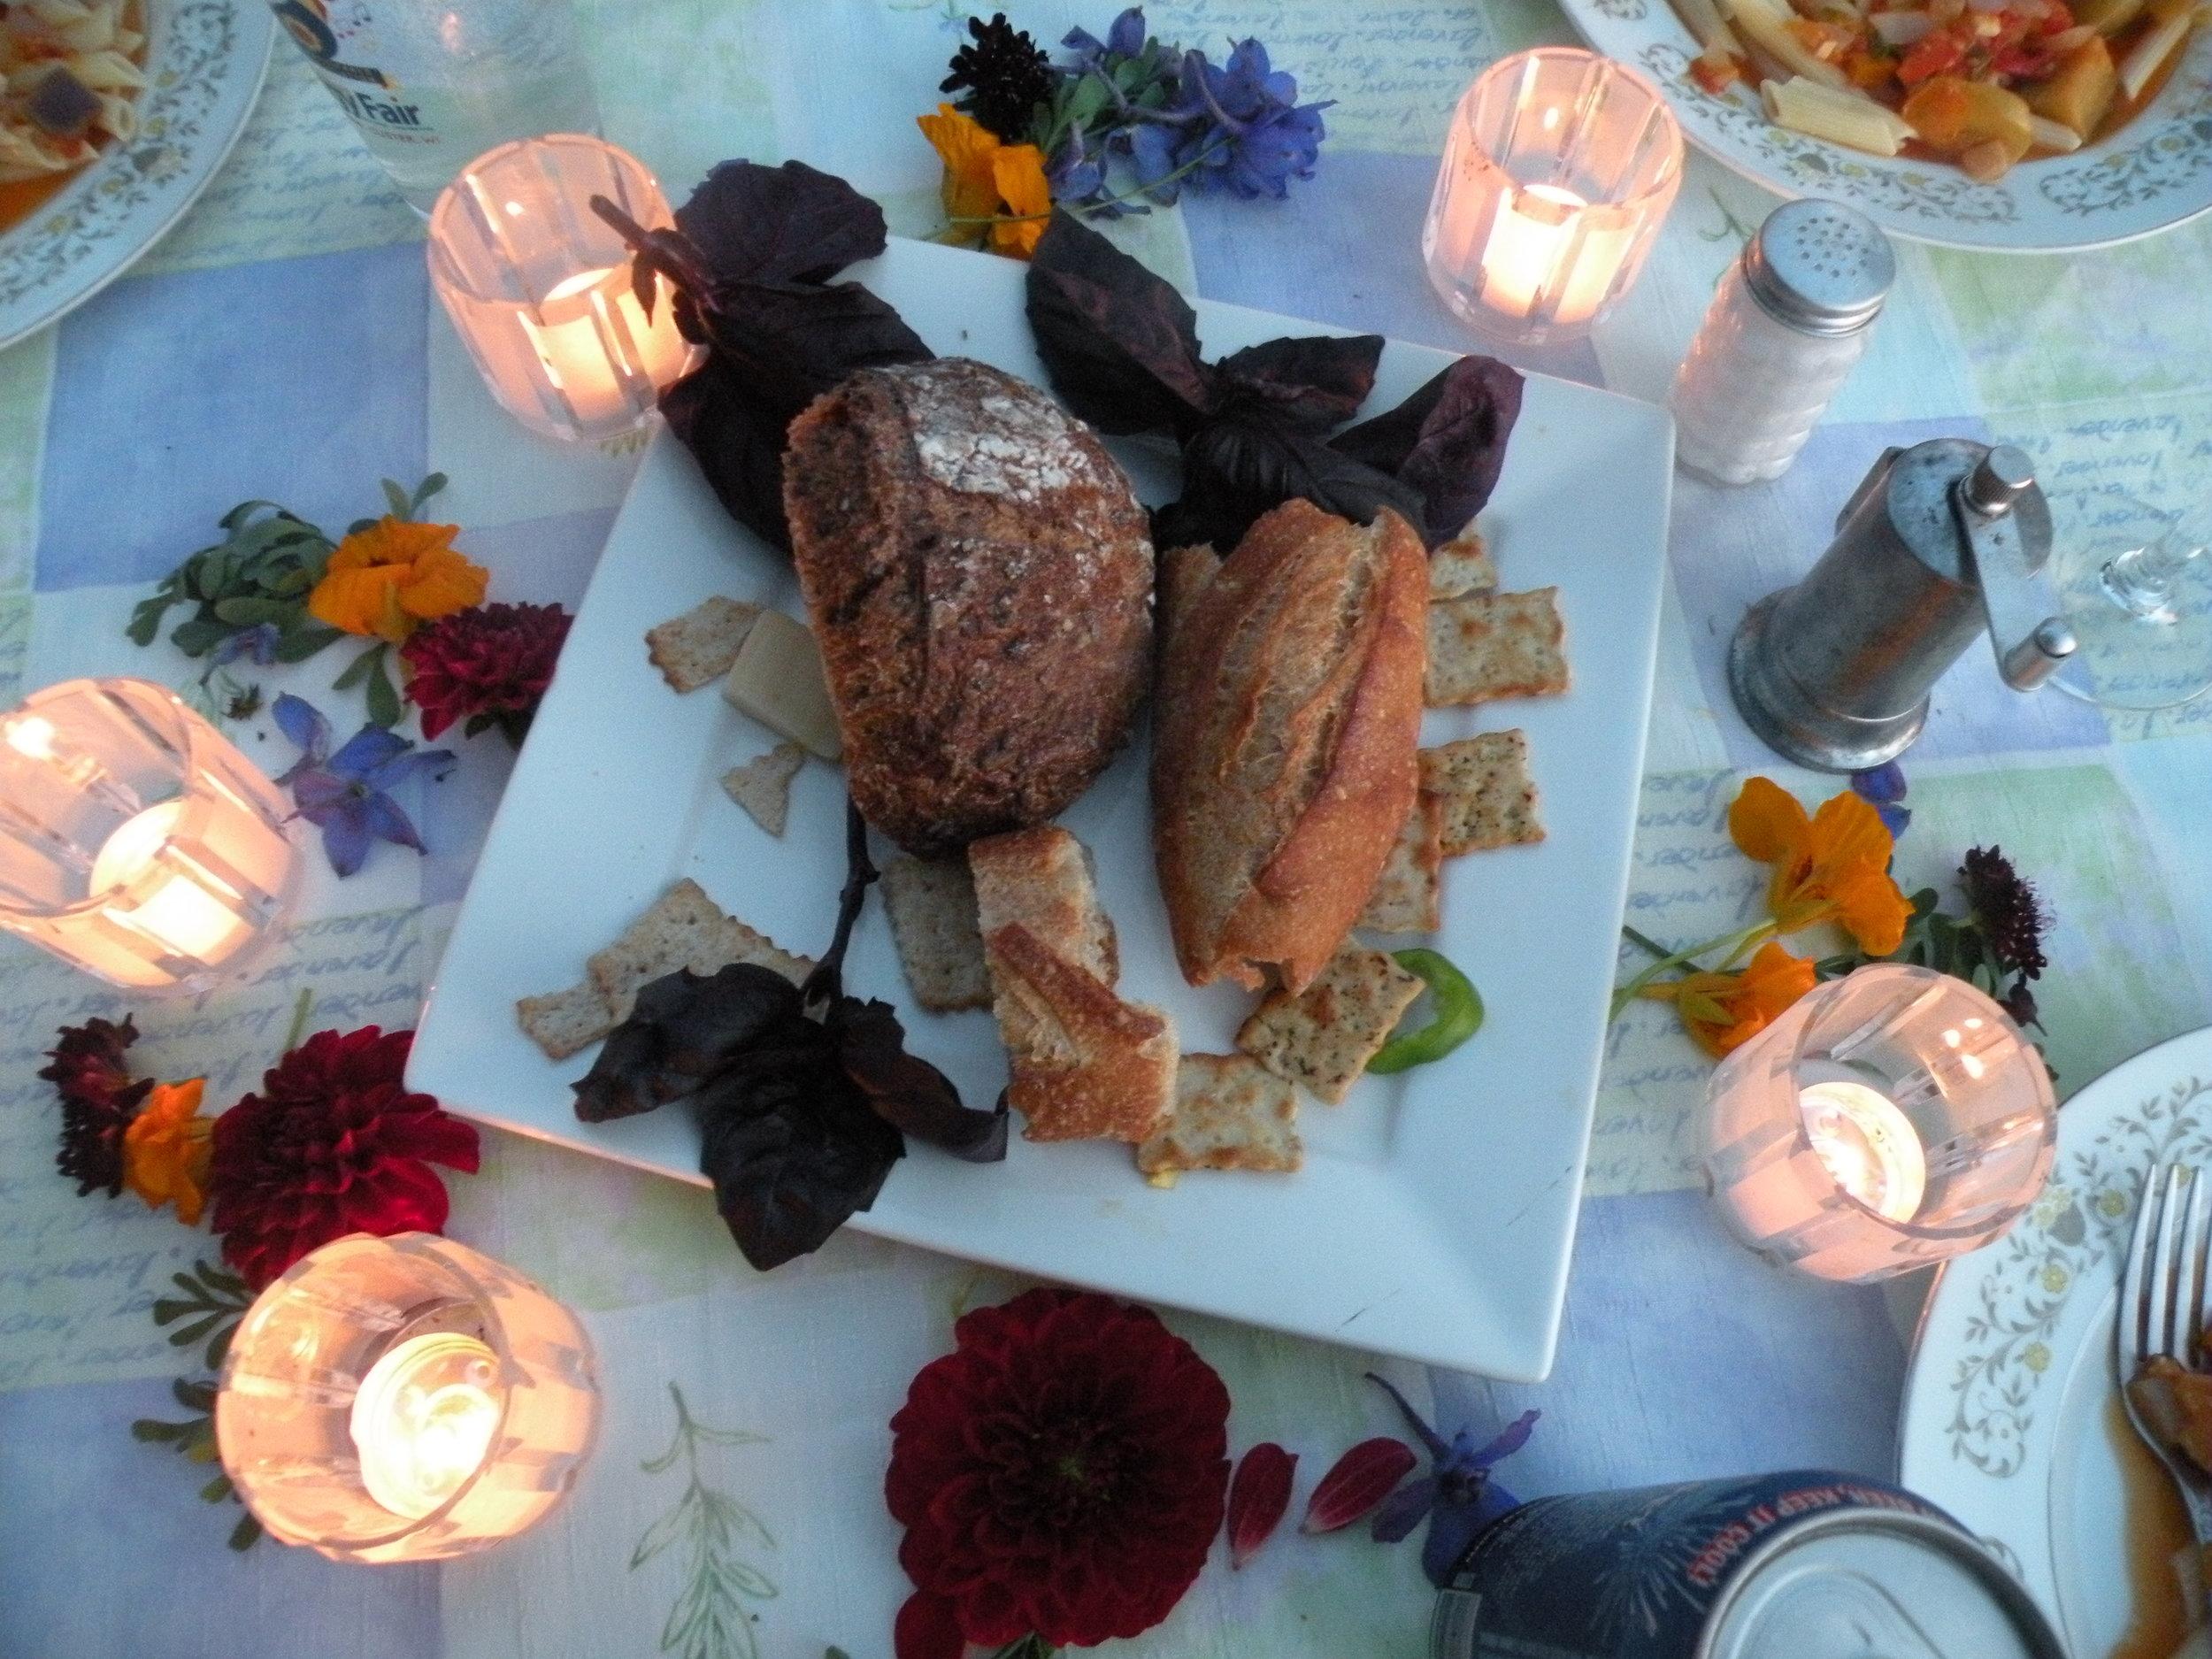 Appetizing on basil and calendula blooms